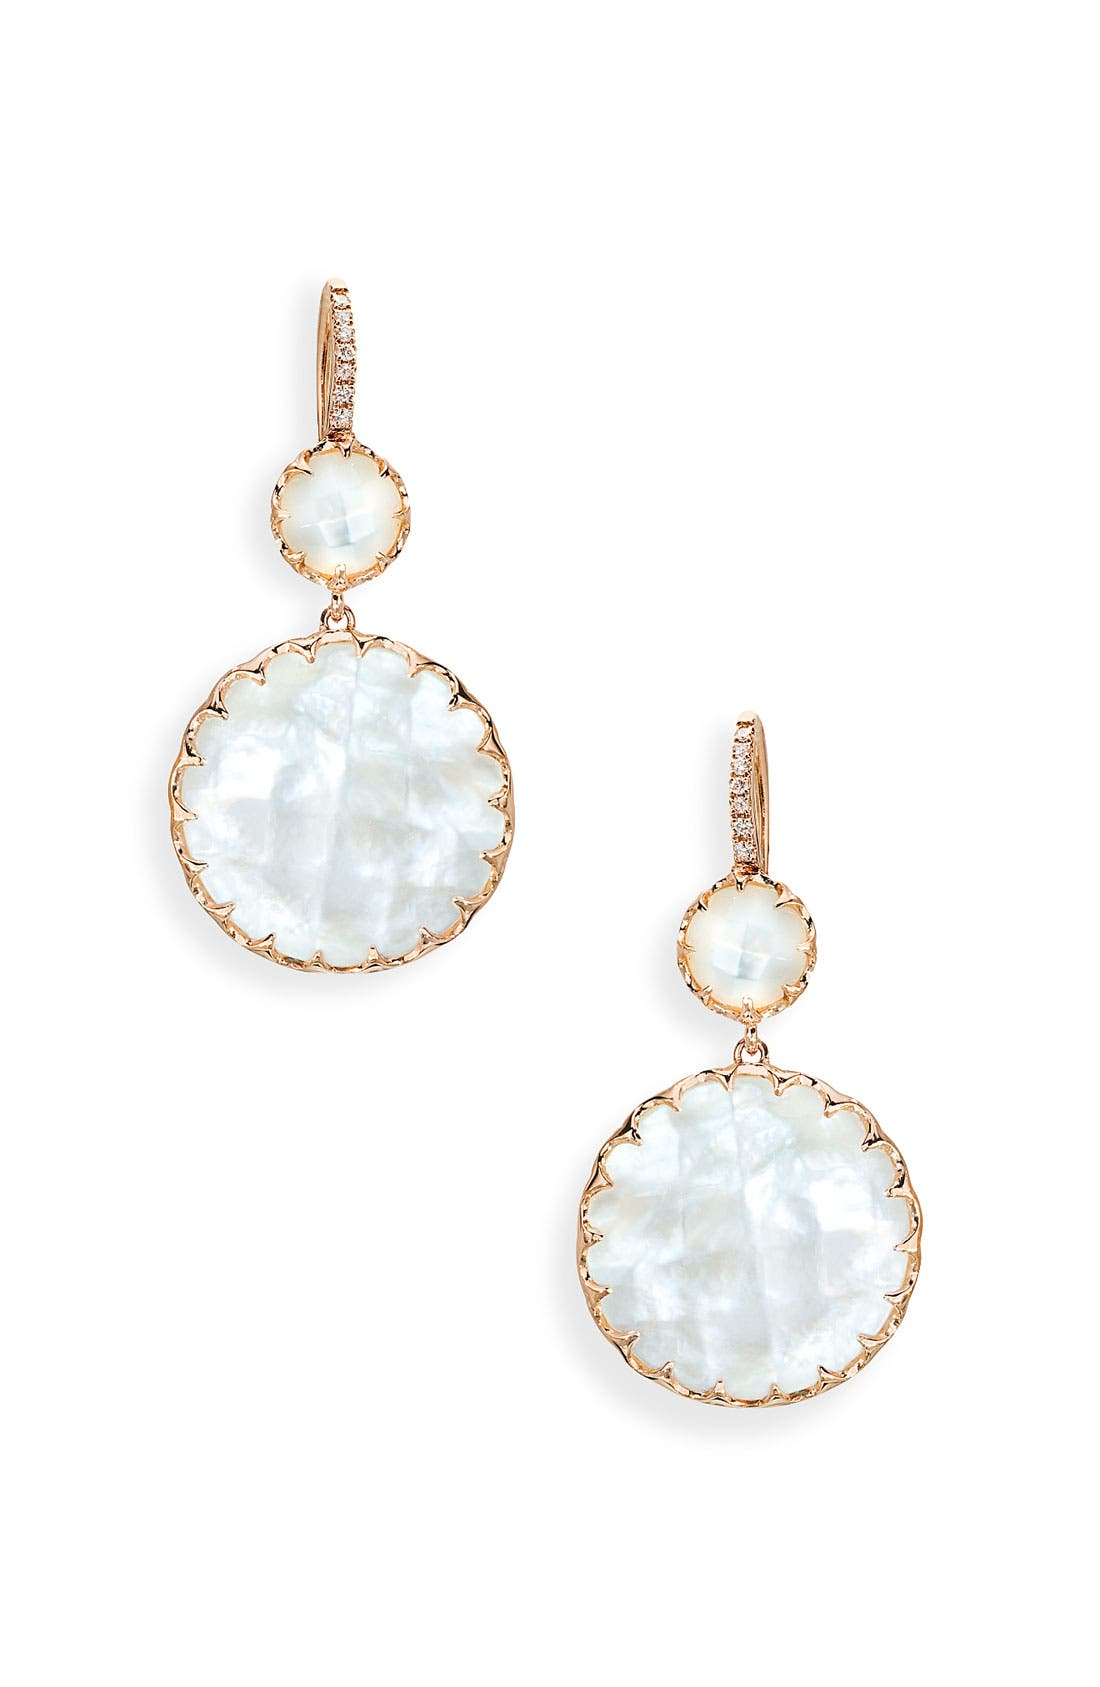 Alternate Image 1 Selected - Ivanka Trump 'Rose Gold' Stone & Diamond Earrings